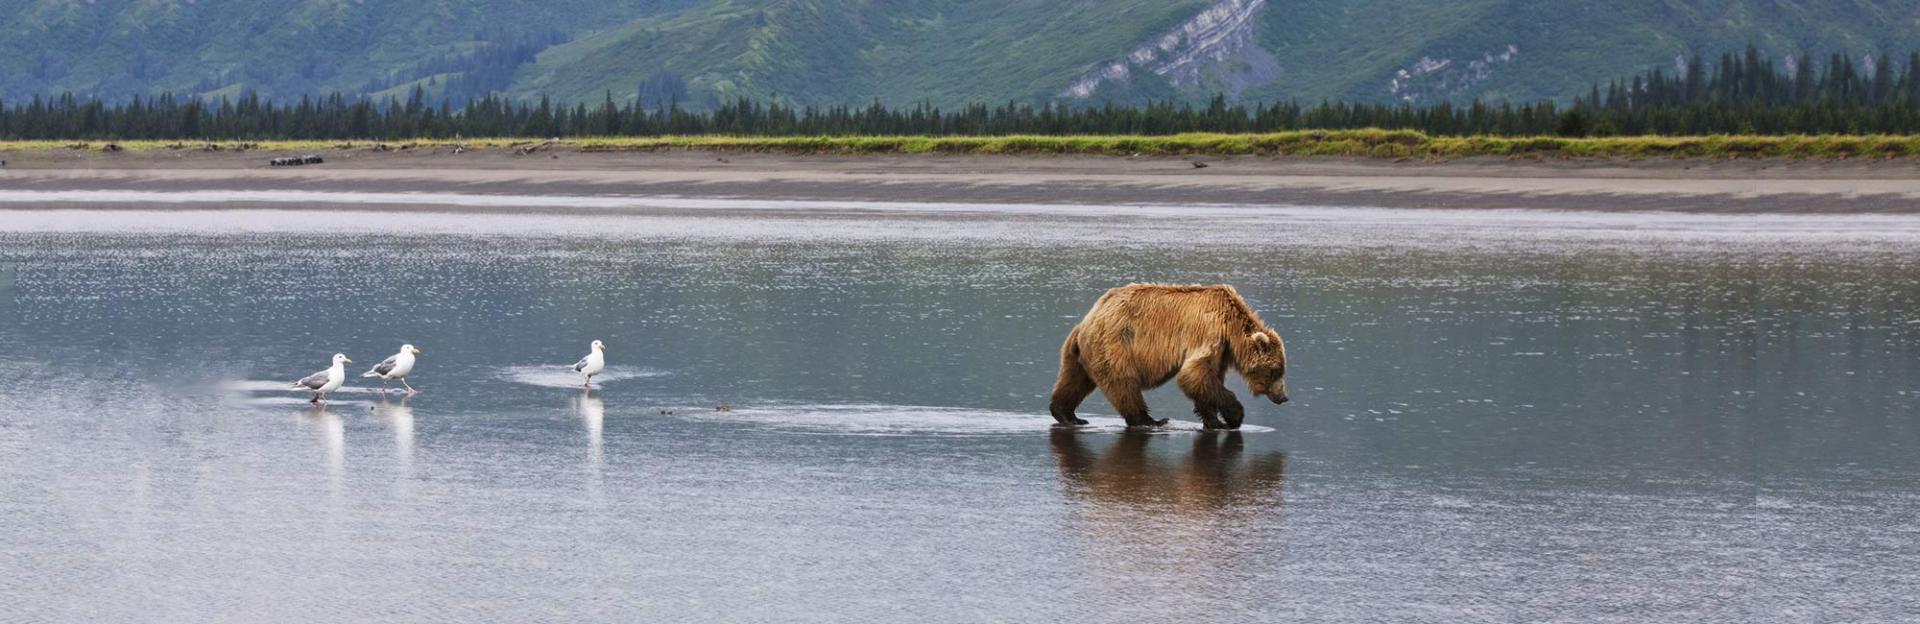 National Geographic Tours >> Alaska | Holbrook Travel